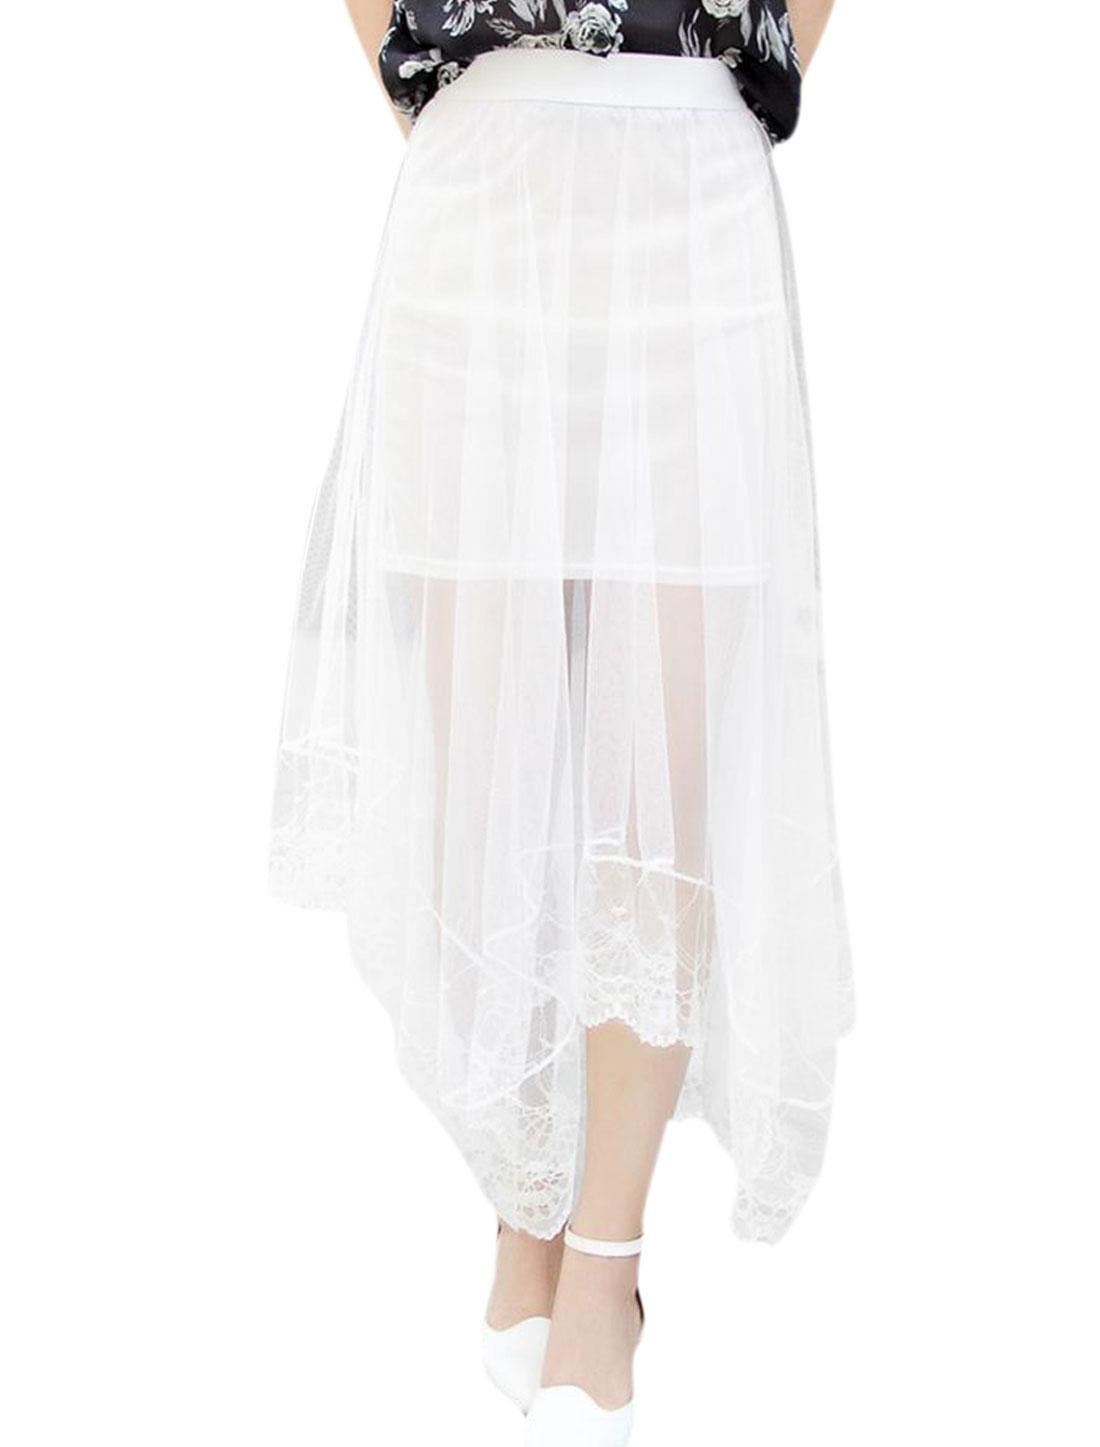 Lady Elastic Waist Semi Sheer Asymmetric Hem Lace Skirt White S